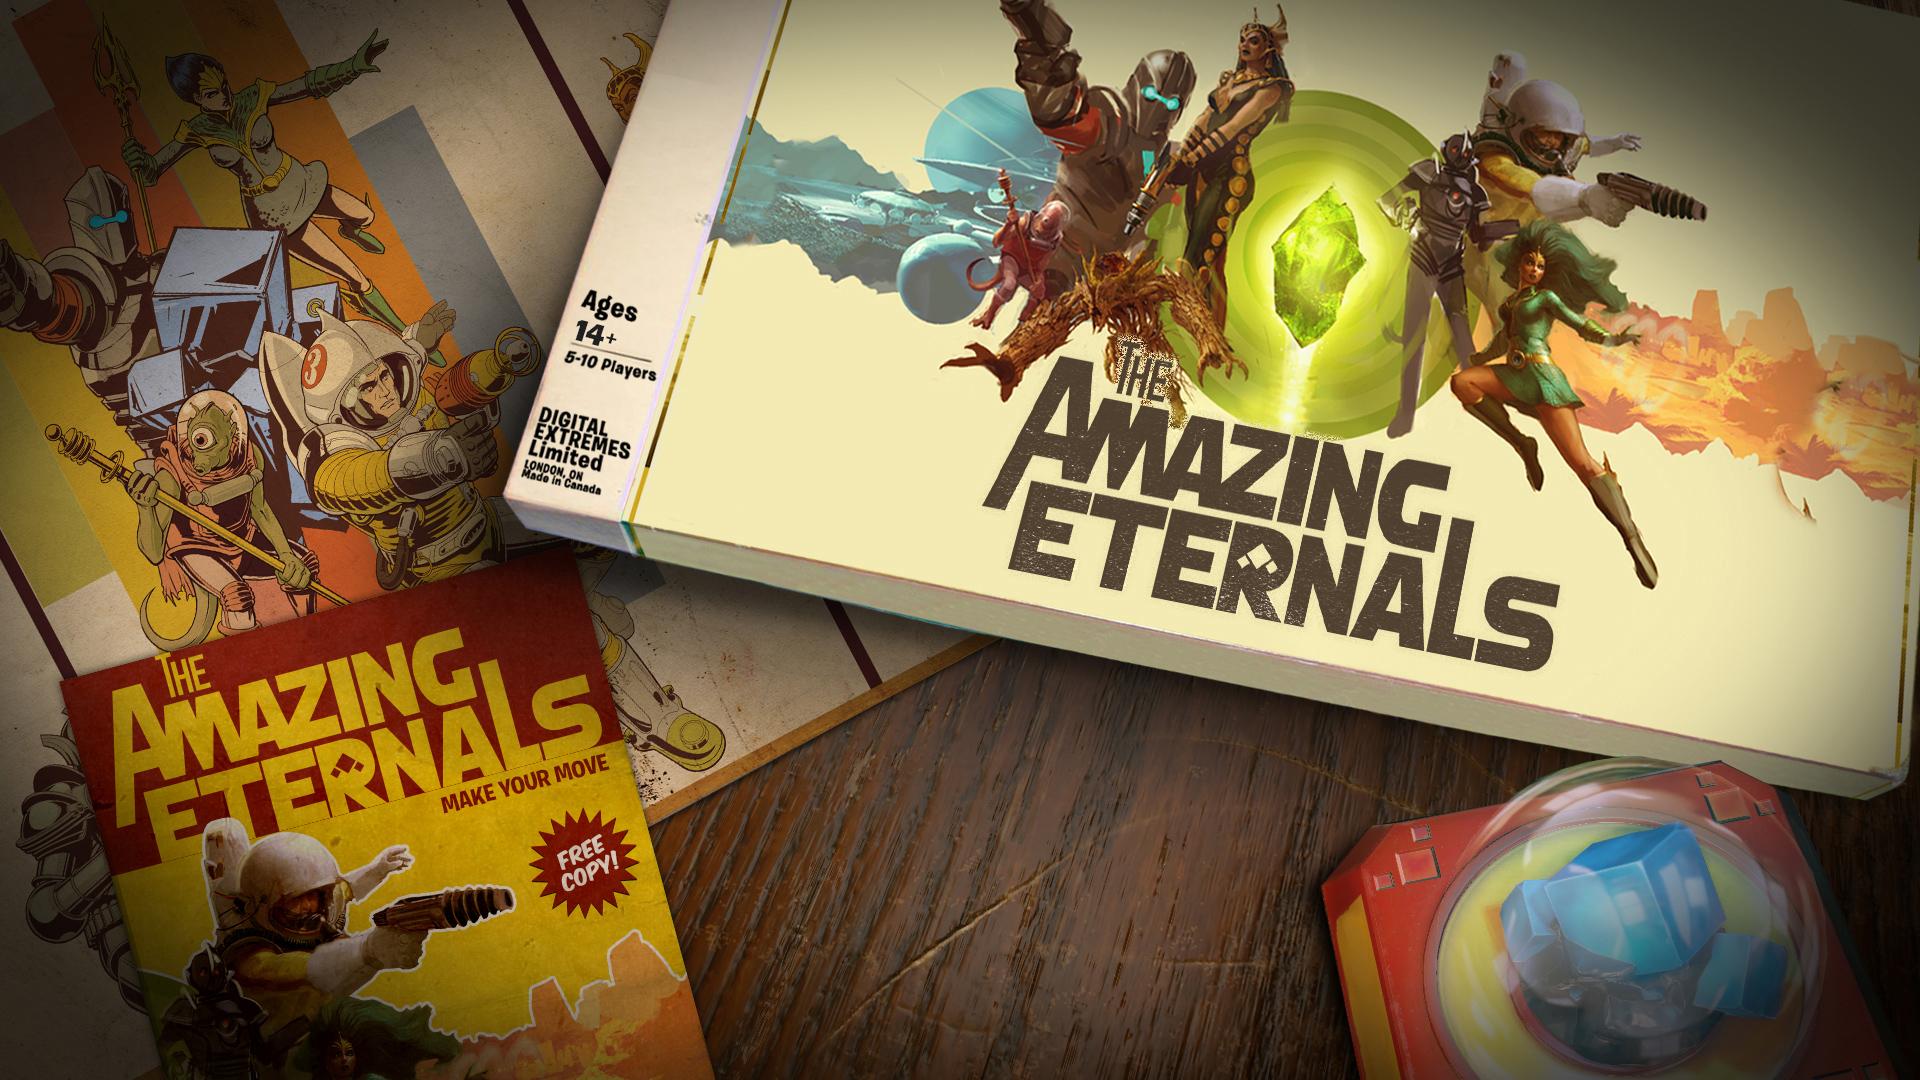 Digital Extremes' hero shooter The Amazing Eternals looks promising screenshot